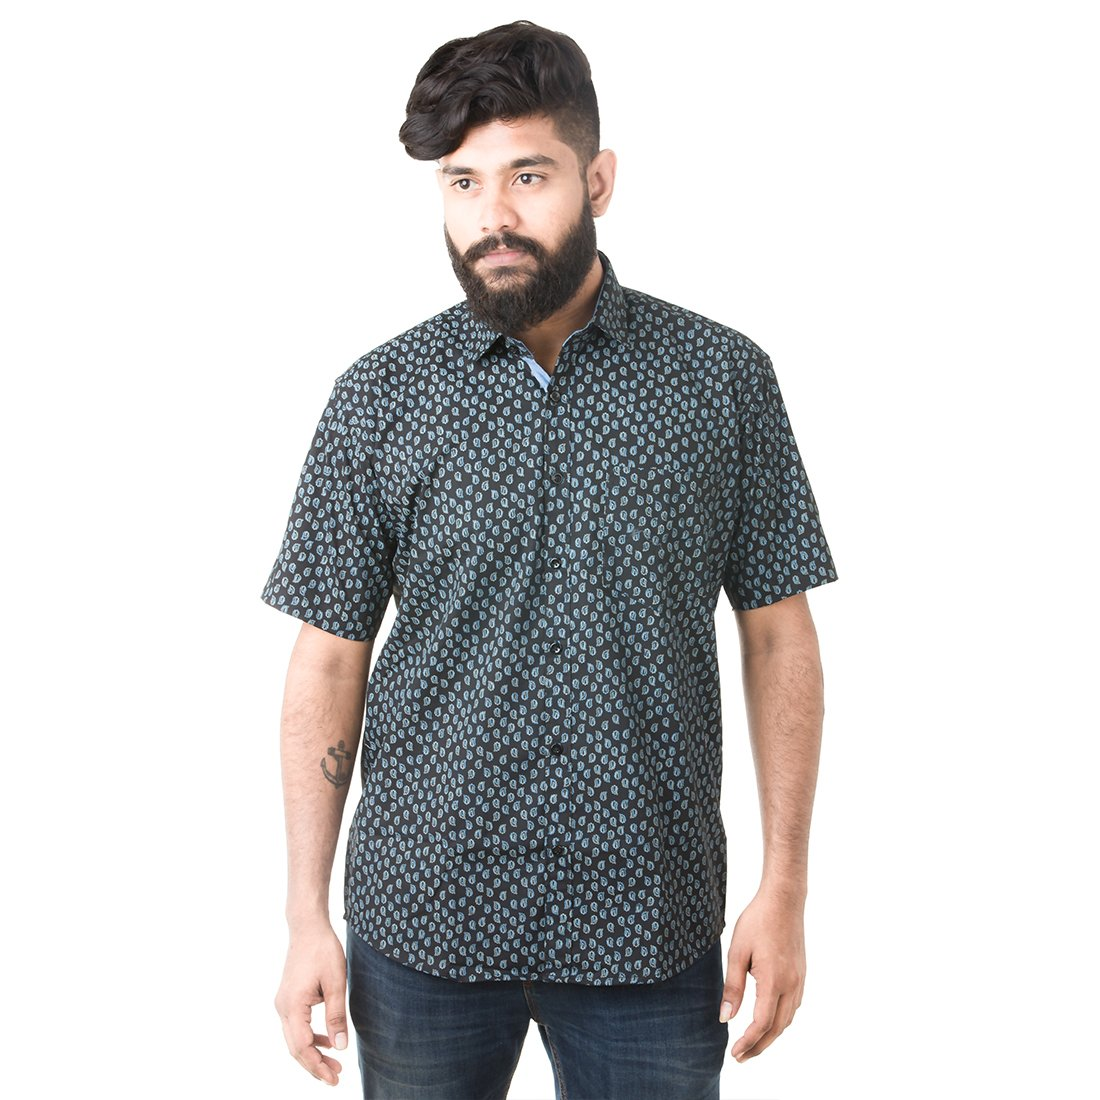 a570133d15ed Smart Casual Shirts Mens - DREAMWORKS